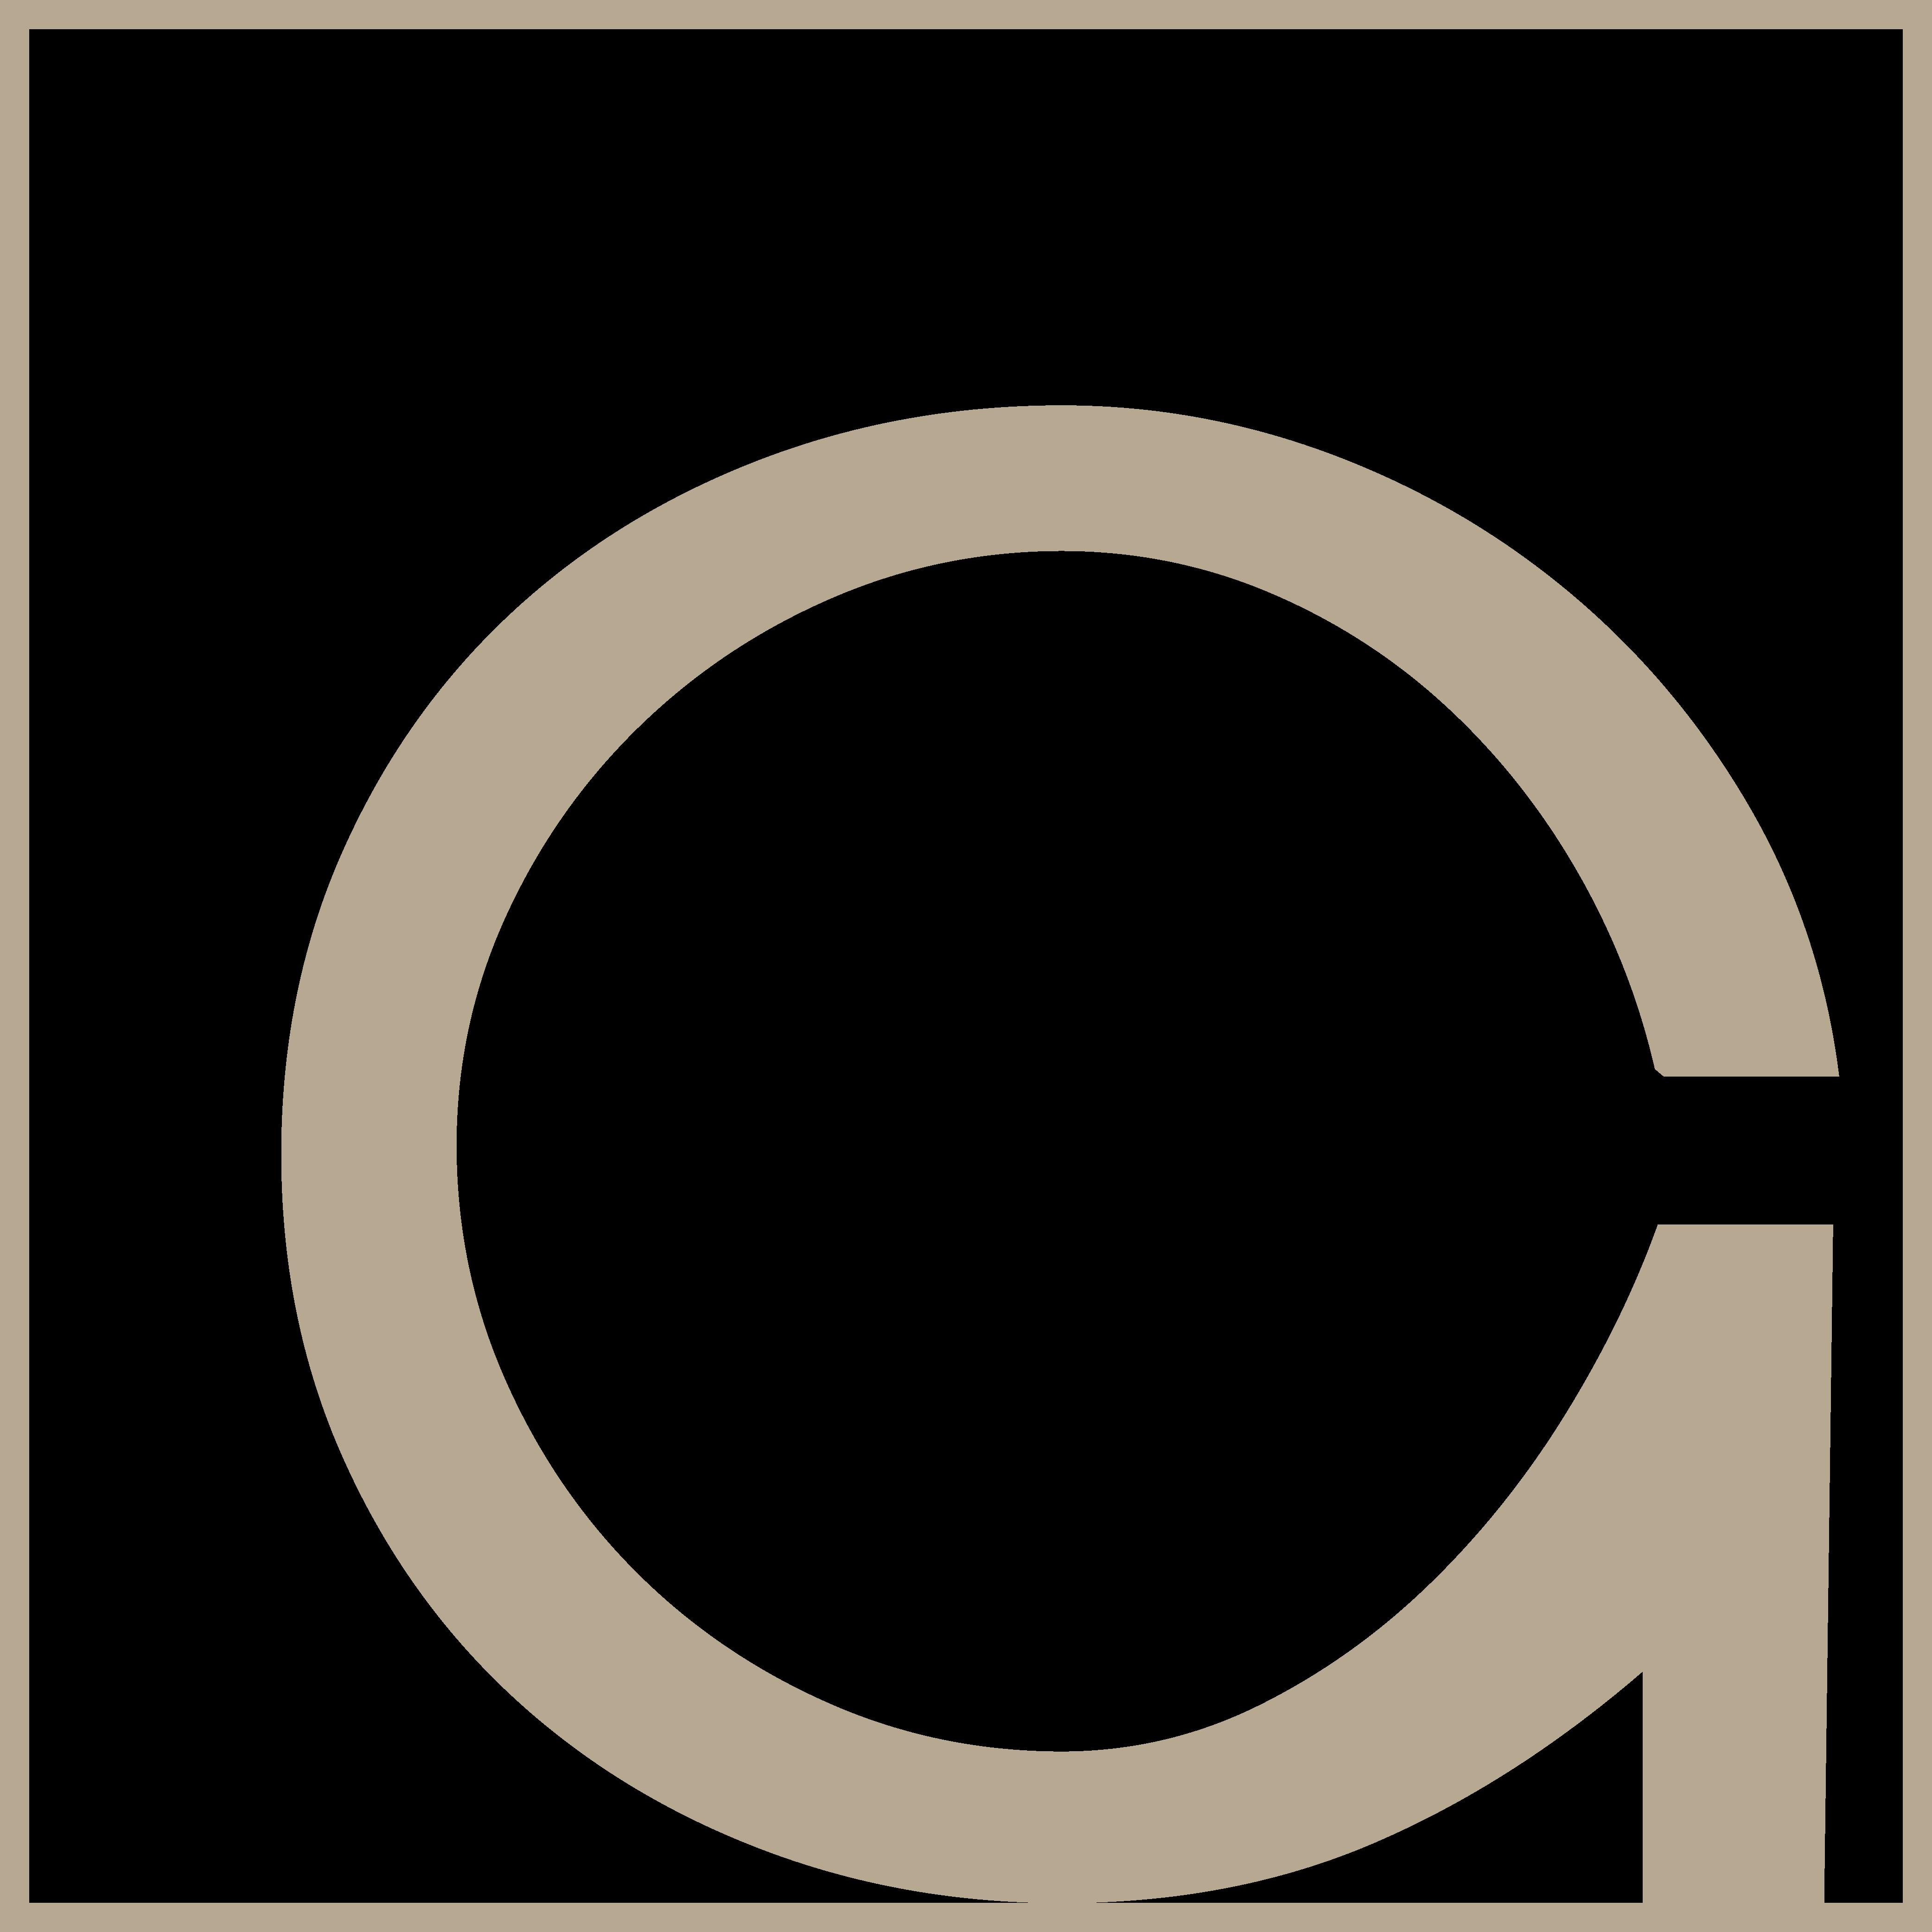 Alfabeto PNG Area 51 BIS (21 Maggio 2021) G